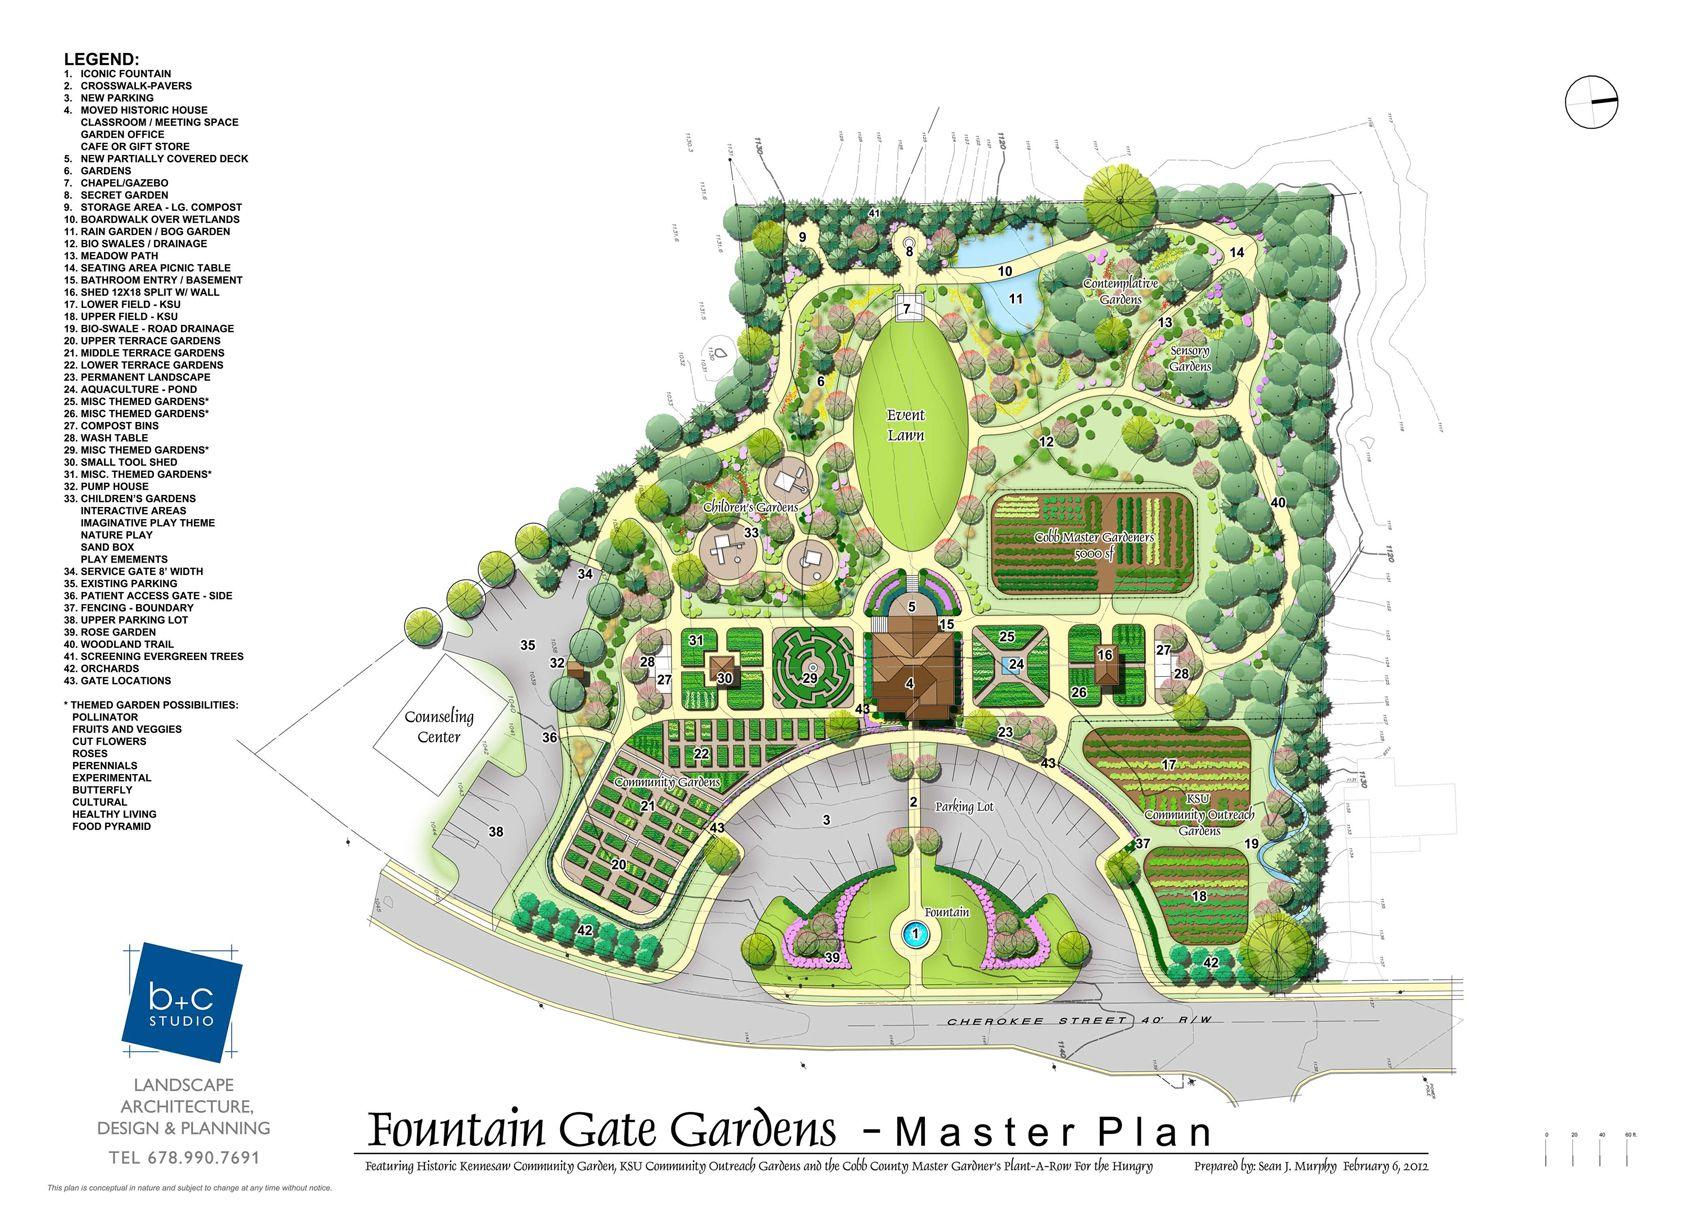 Sensational Small Community Garden Layout On Garden Inspiration With Unusual Small Community Garden Layo Master Plan Landscape Design Landscape Design Drawings